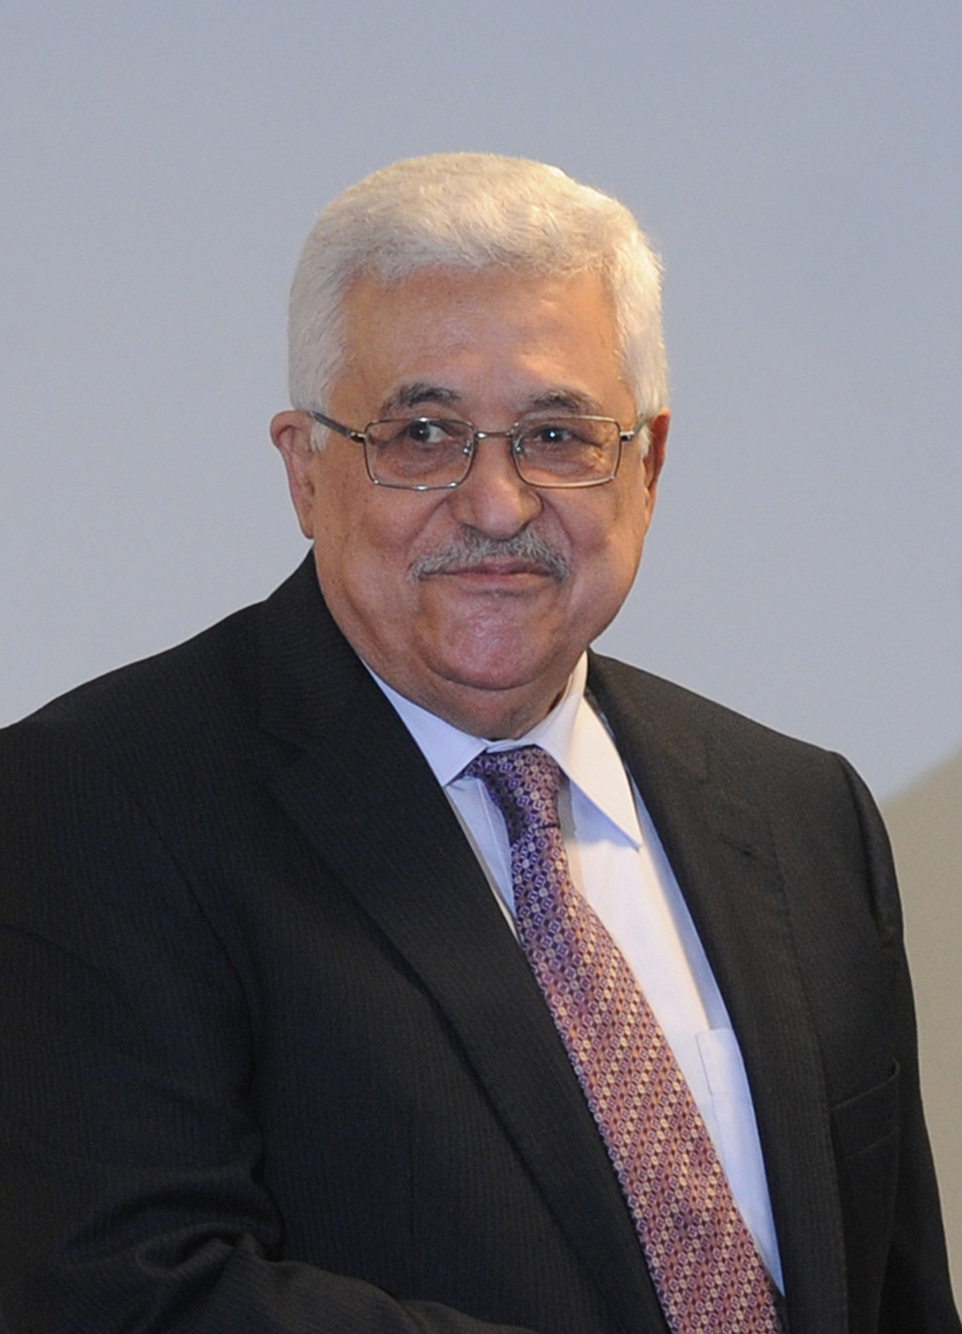 File:Mahmoud Abbas 2011.jpg - Wikimedia Commons